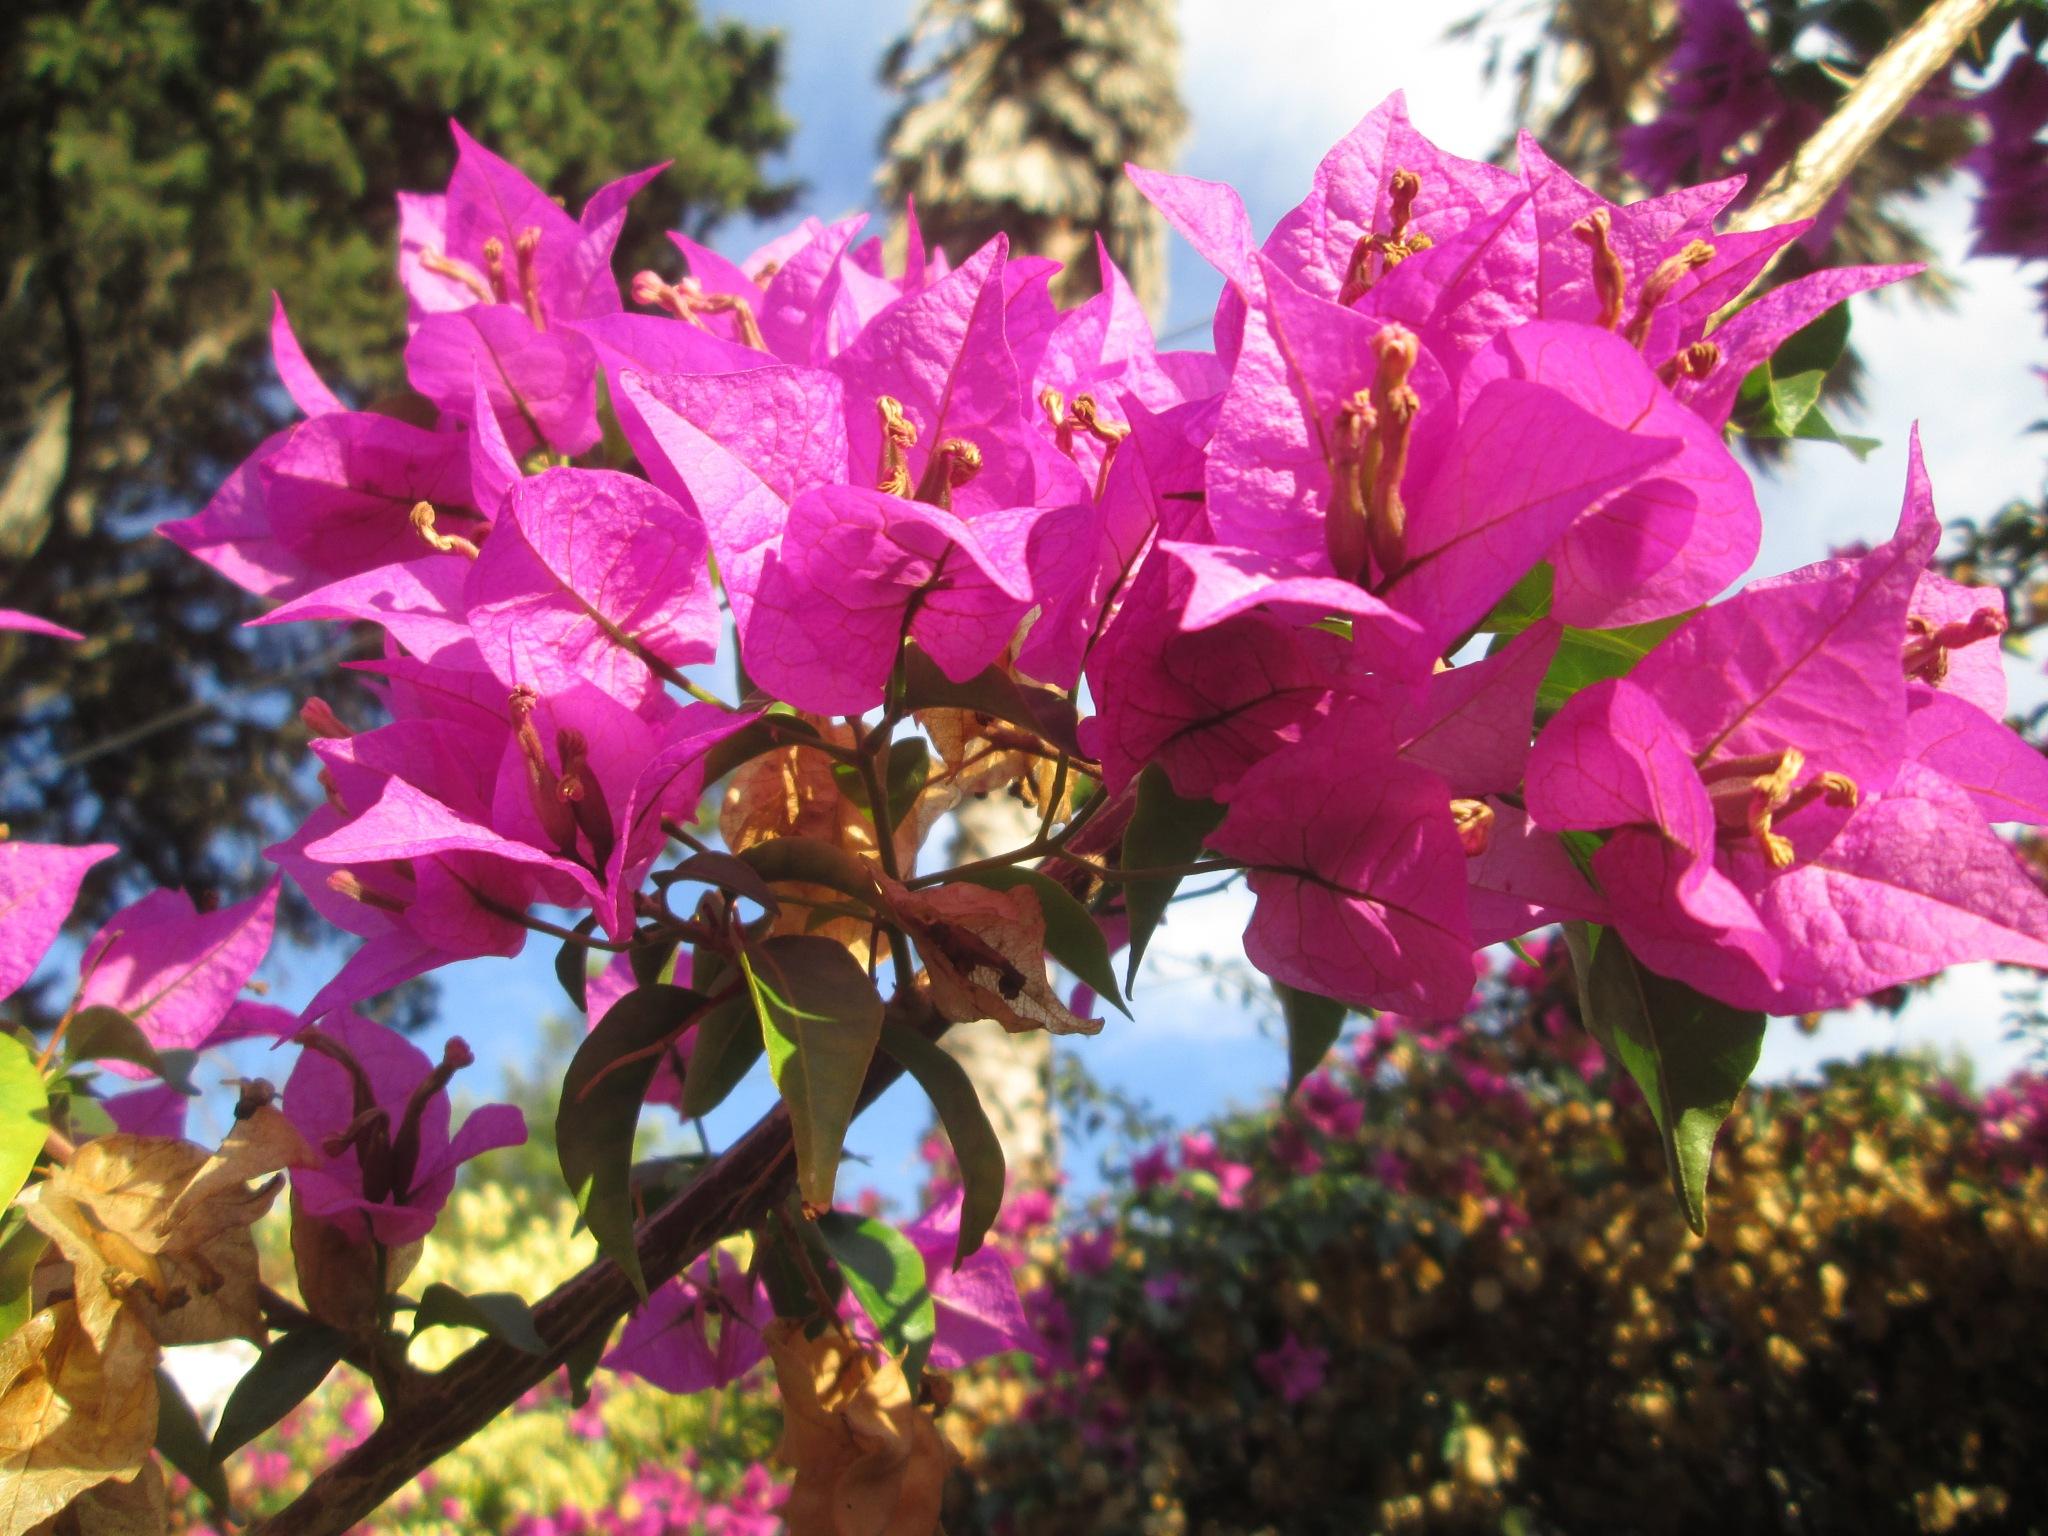 Pretty in pink by michaelwrescz